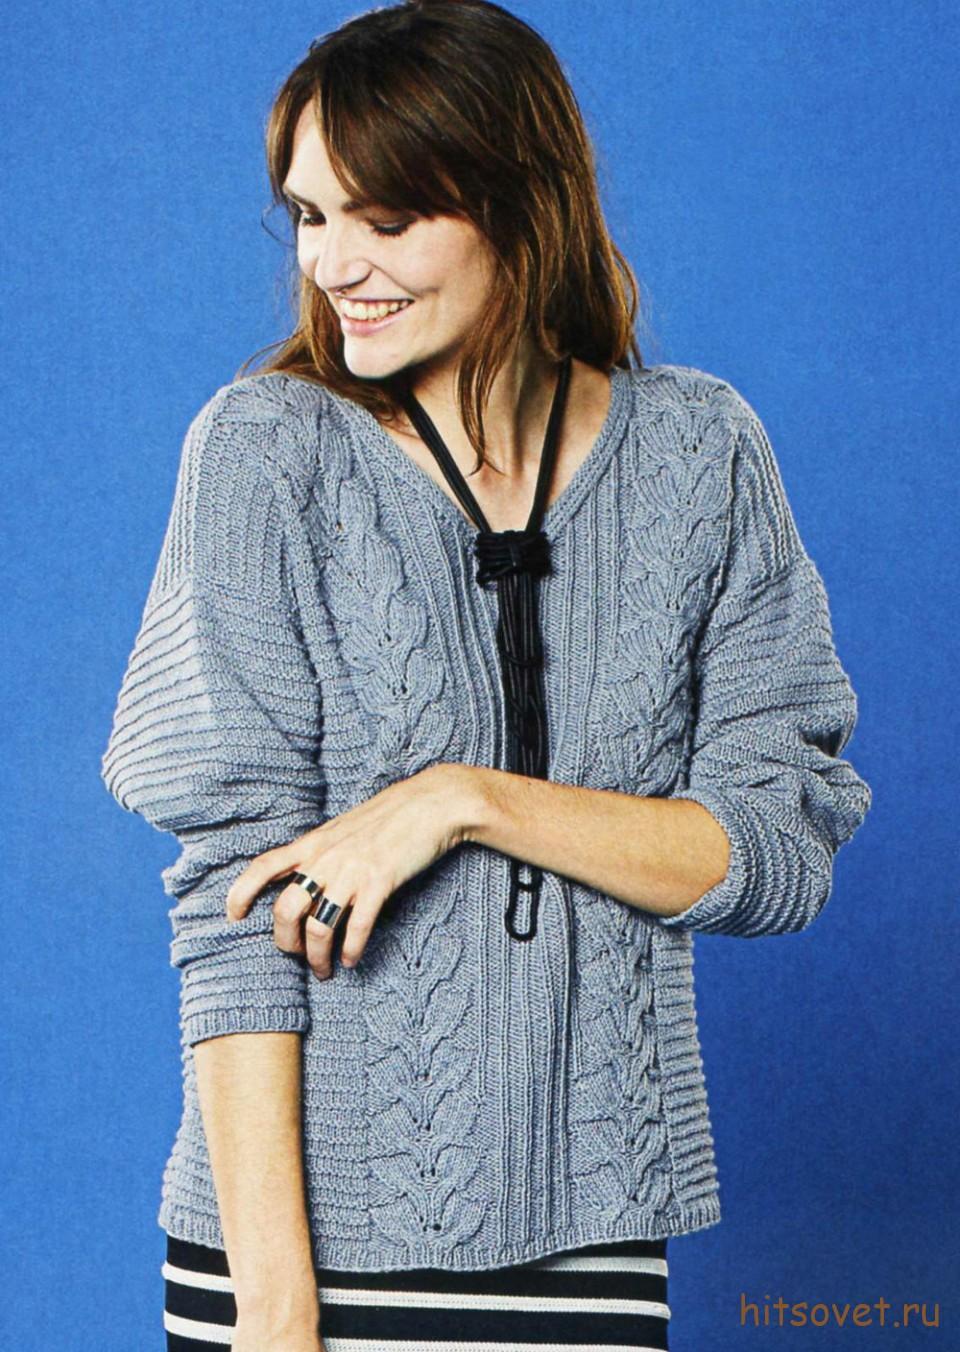 Серый женский пуловер с косами, фото 2.